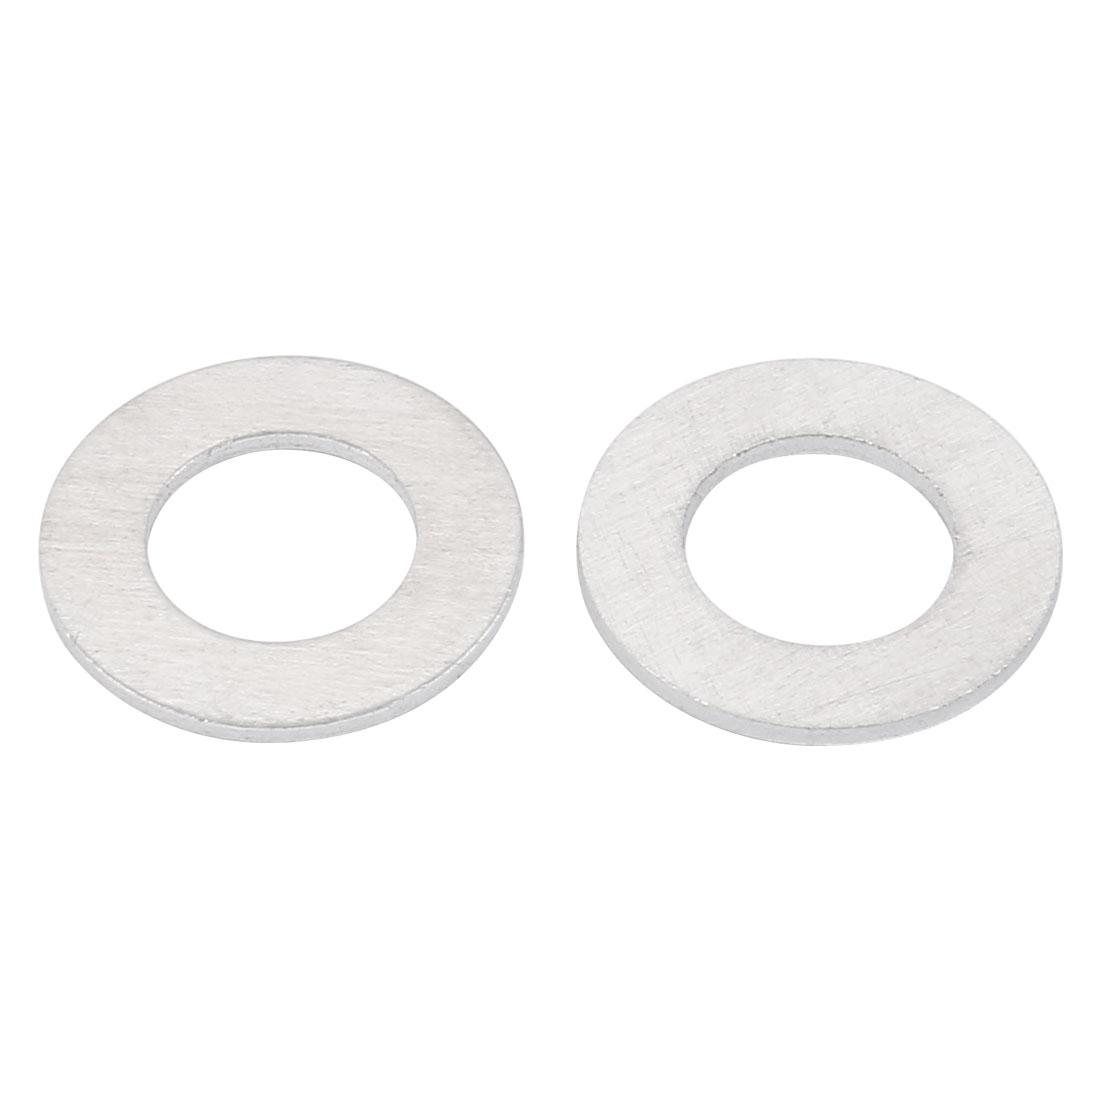 9mmx17mmx1mm Motorcycle Hardware Drain Plug Crush Aluminum Washer Seals 50pcs - image 1 de 2